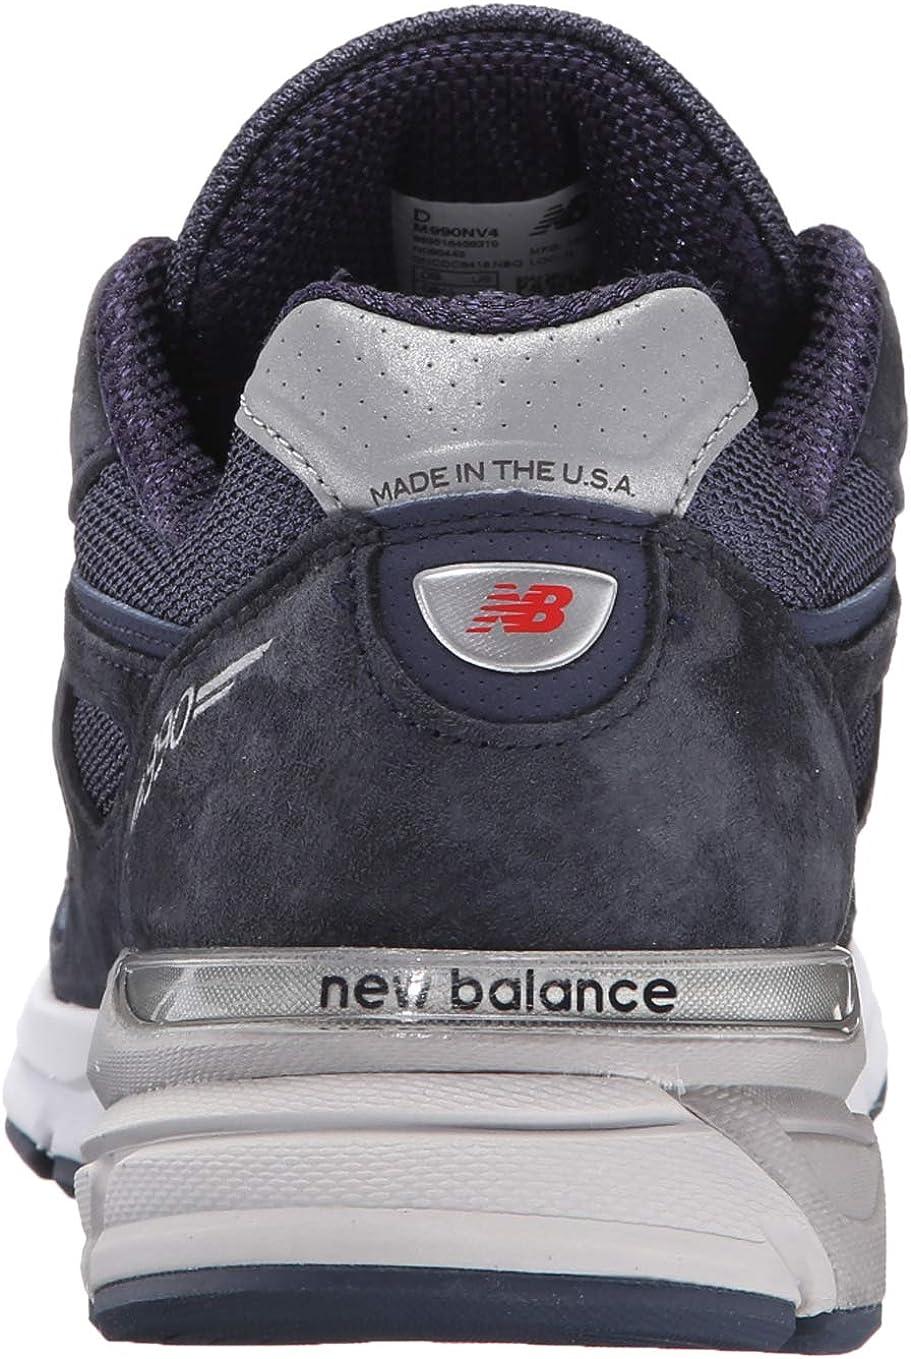 mens new balance 990 joe's